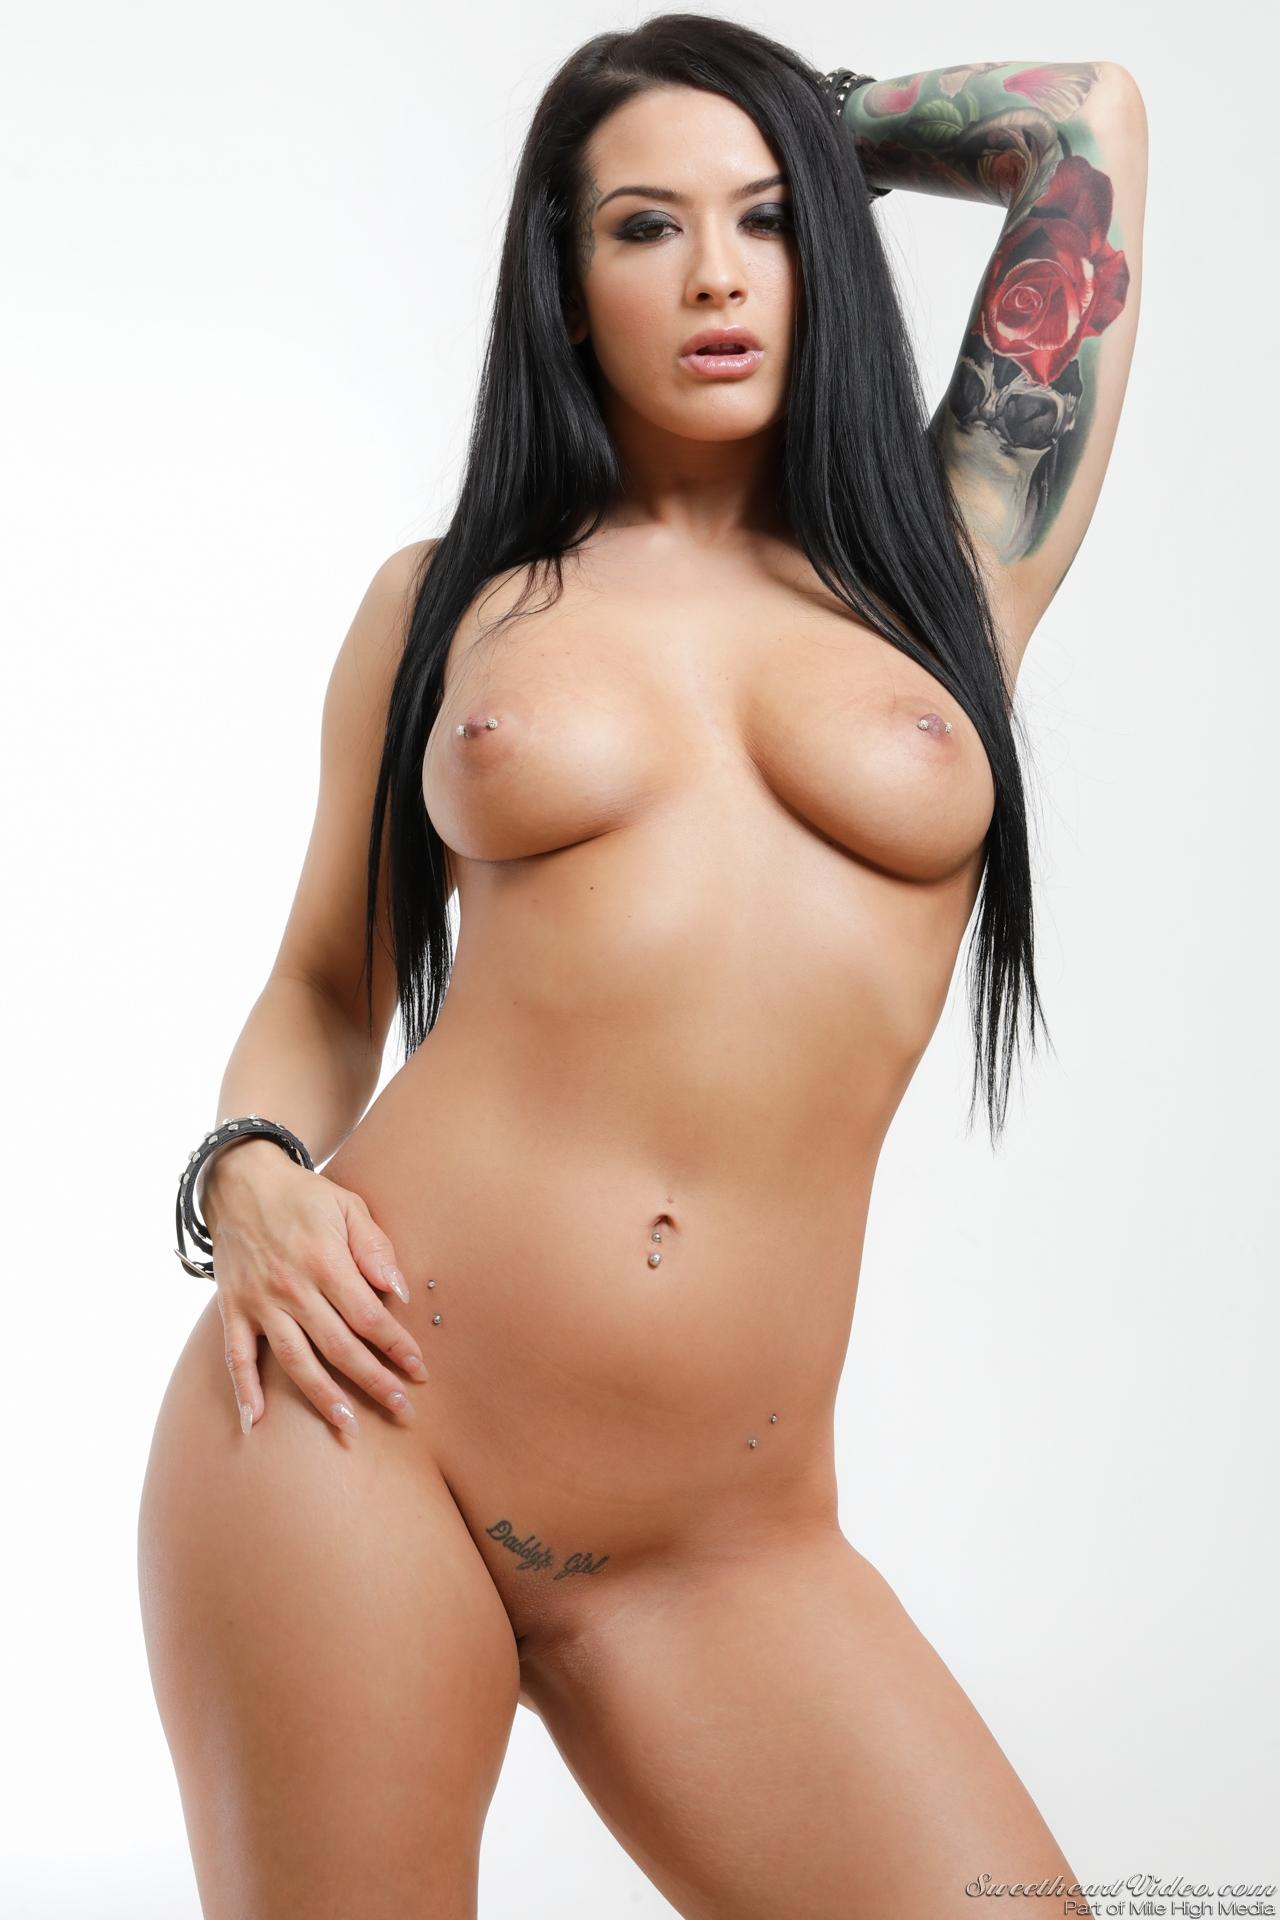 Jayden cole lesbian in bikini frankenstein scandalplanetcom - 3 part 2